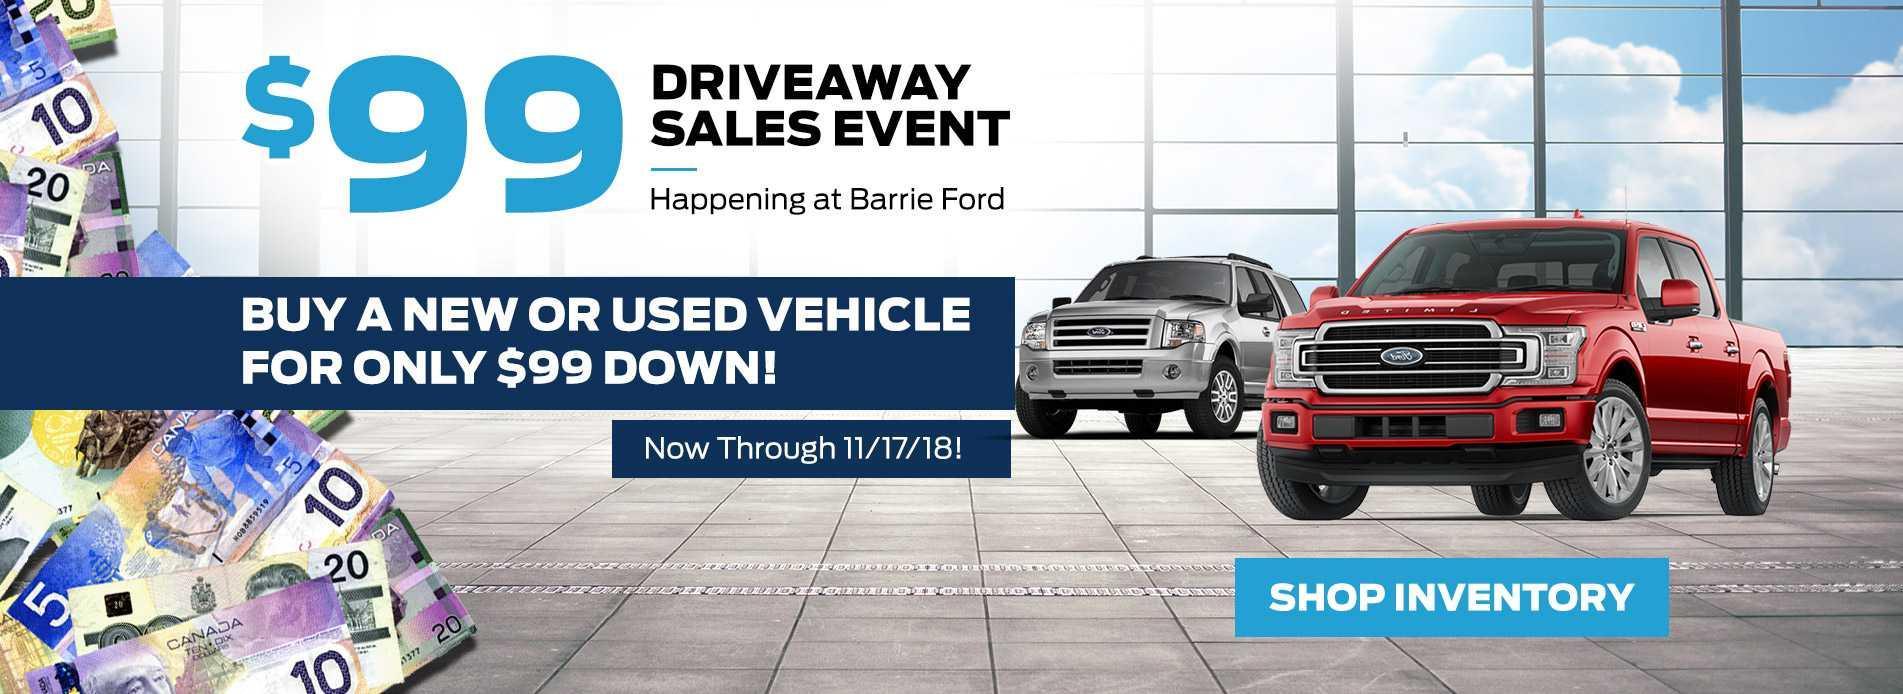 Driveaway Event